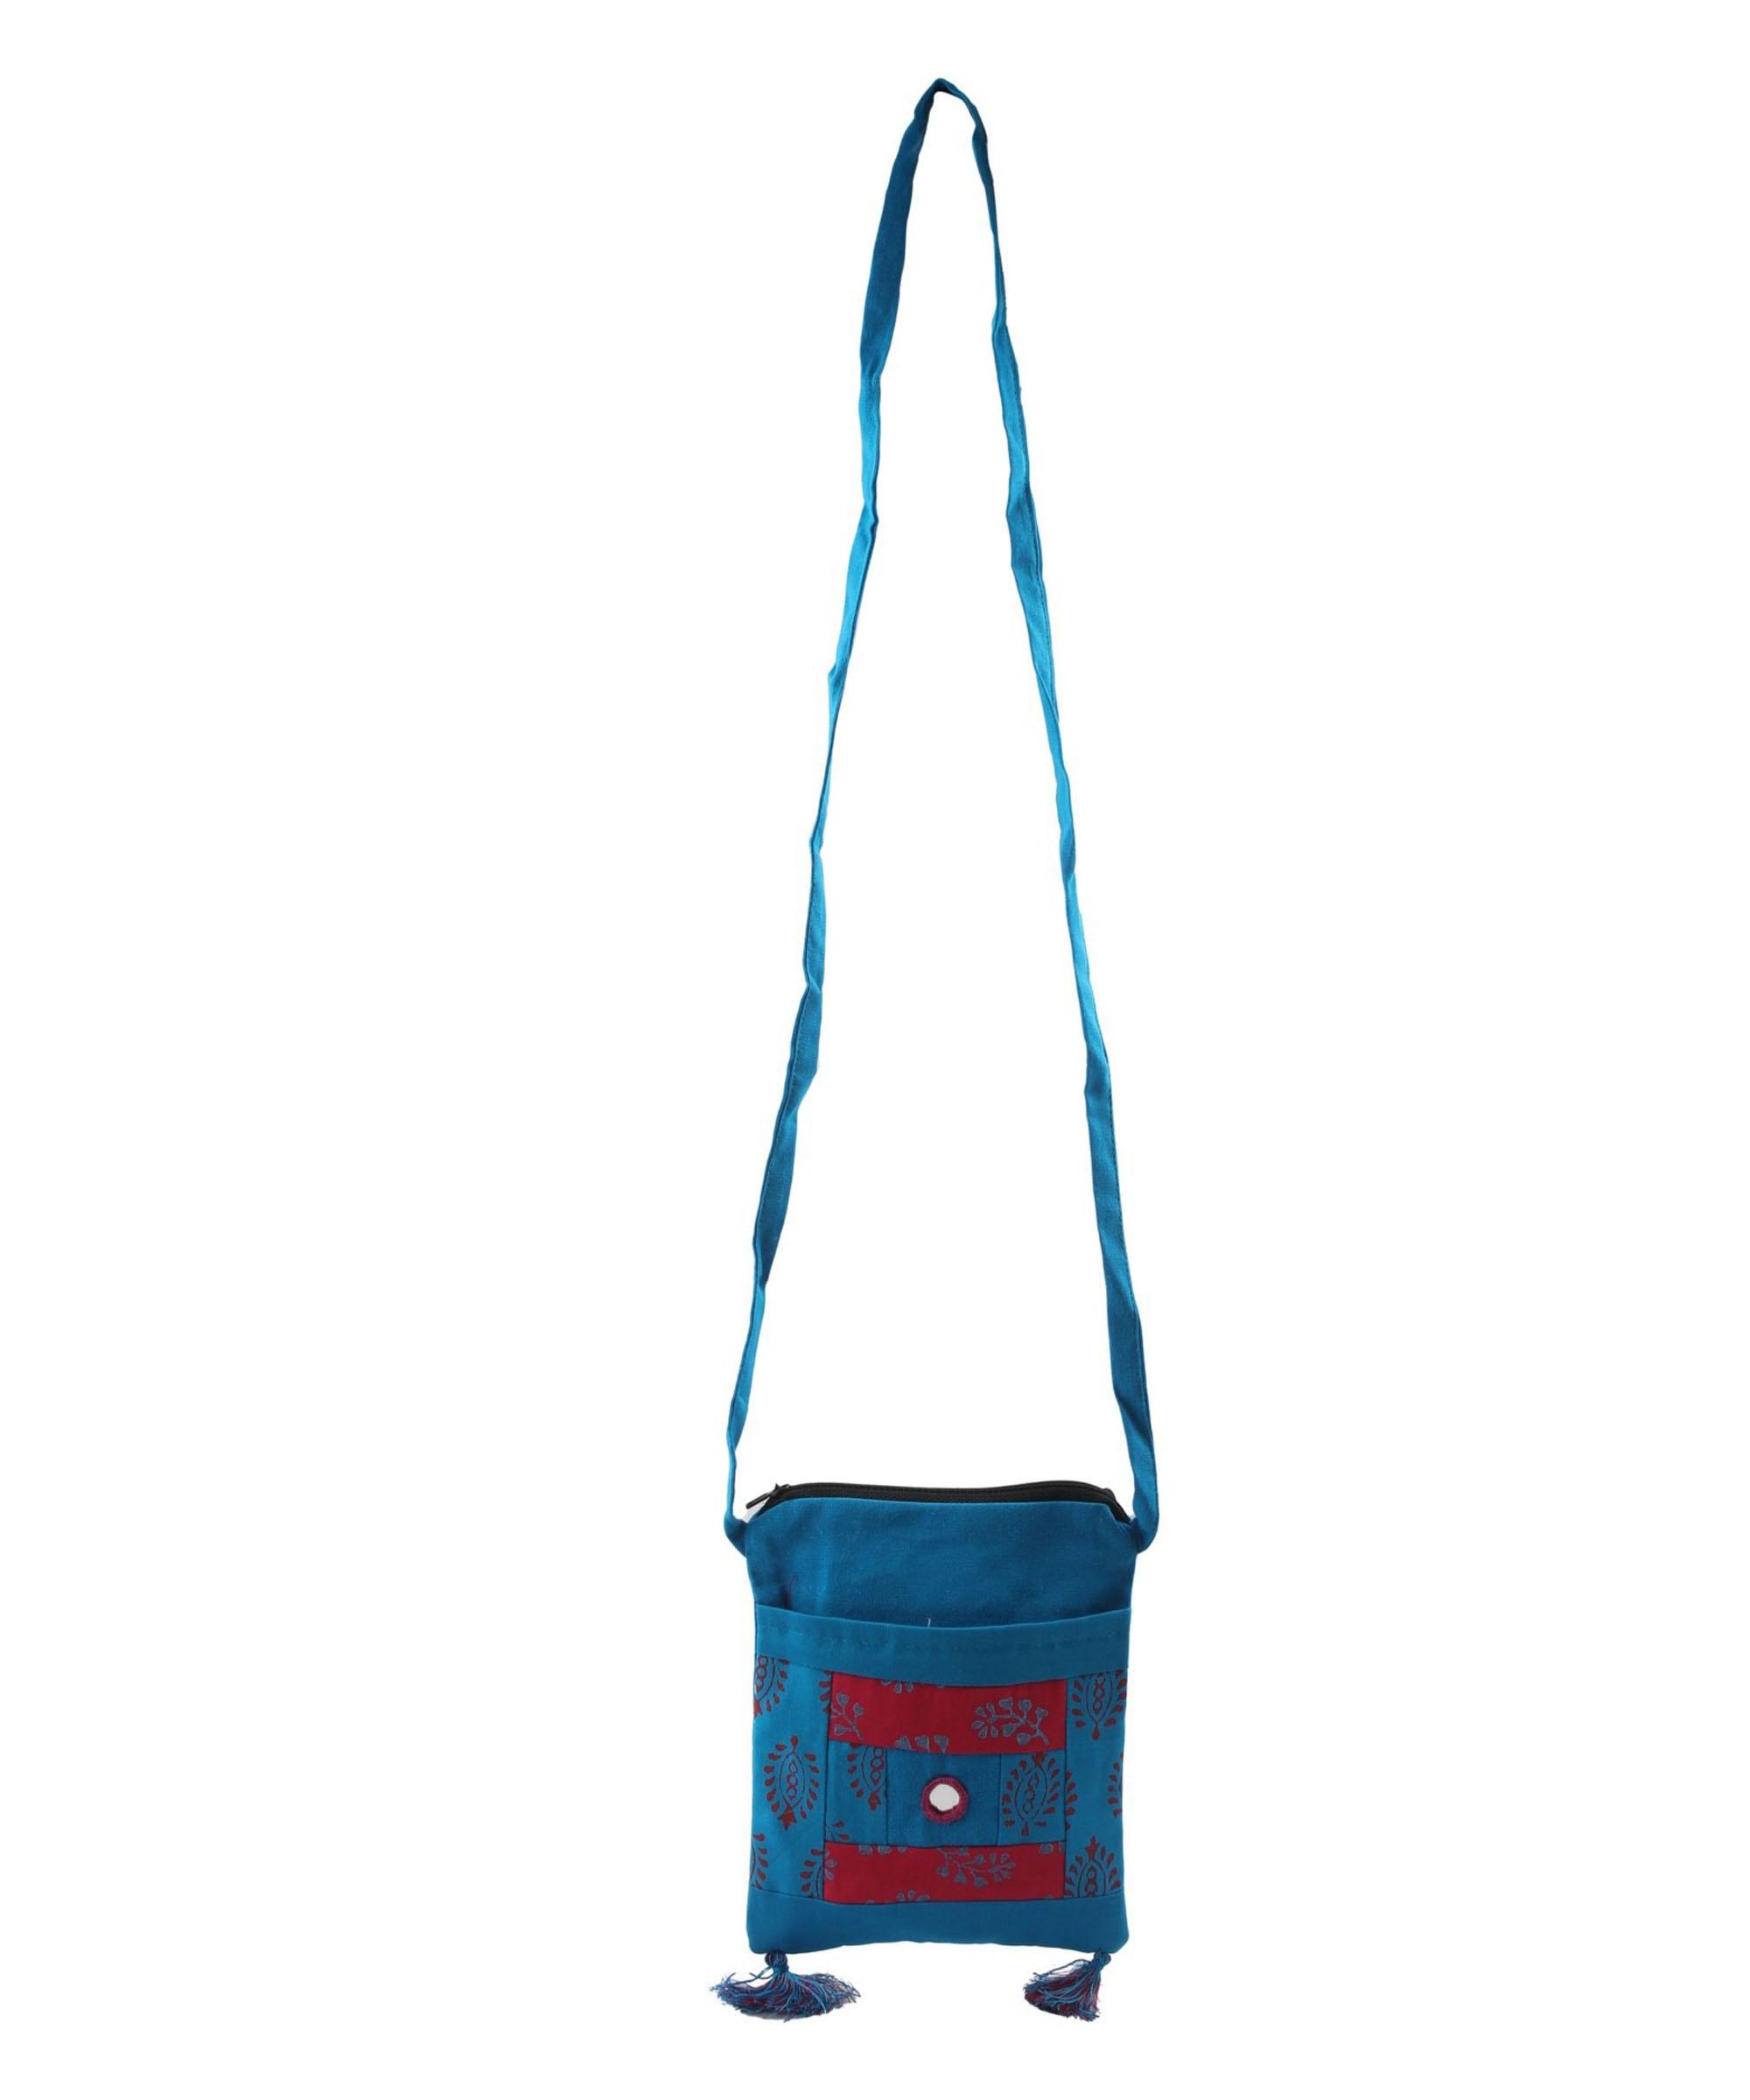 Women's Blue WIEA Sling Bag (Set of 2) Slider Thumbnail 2/5